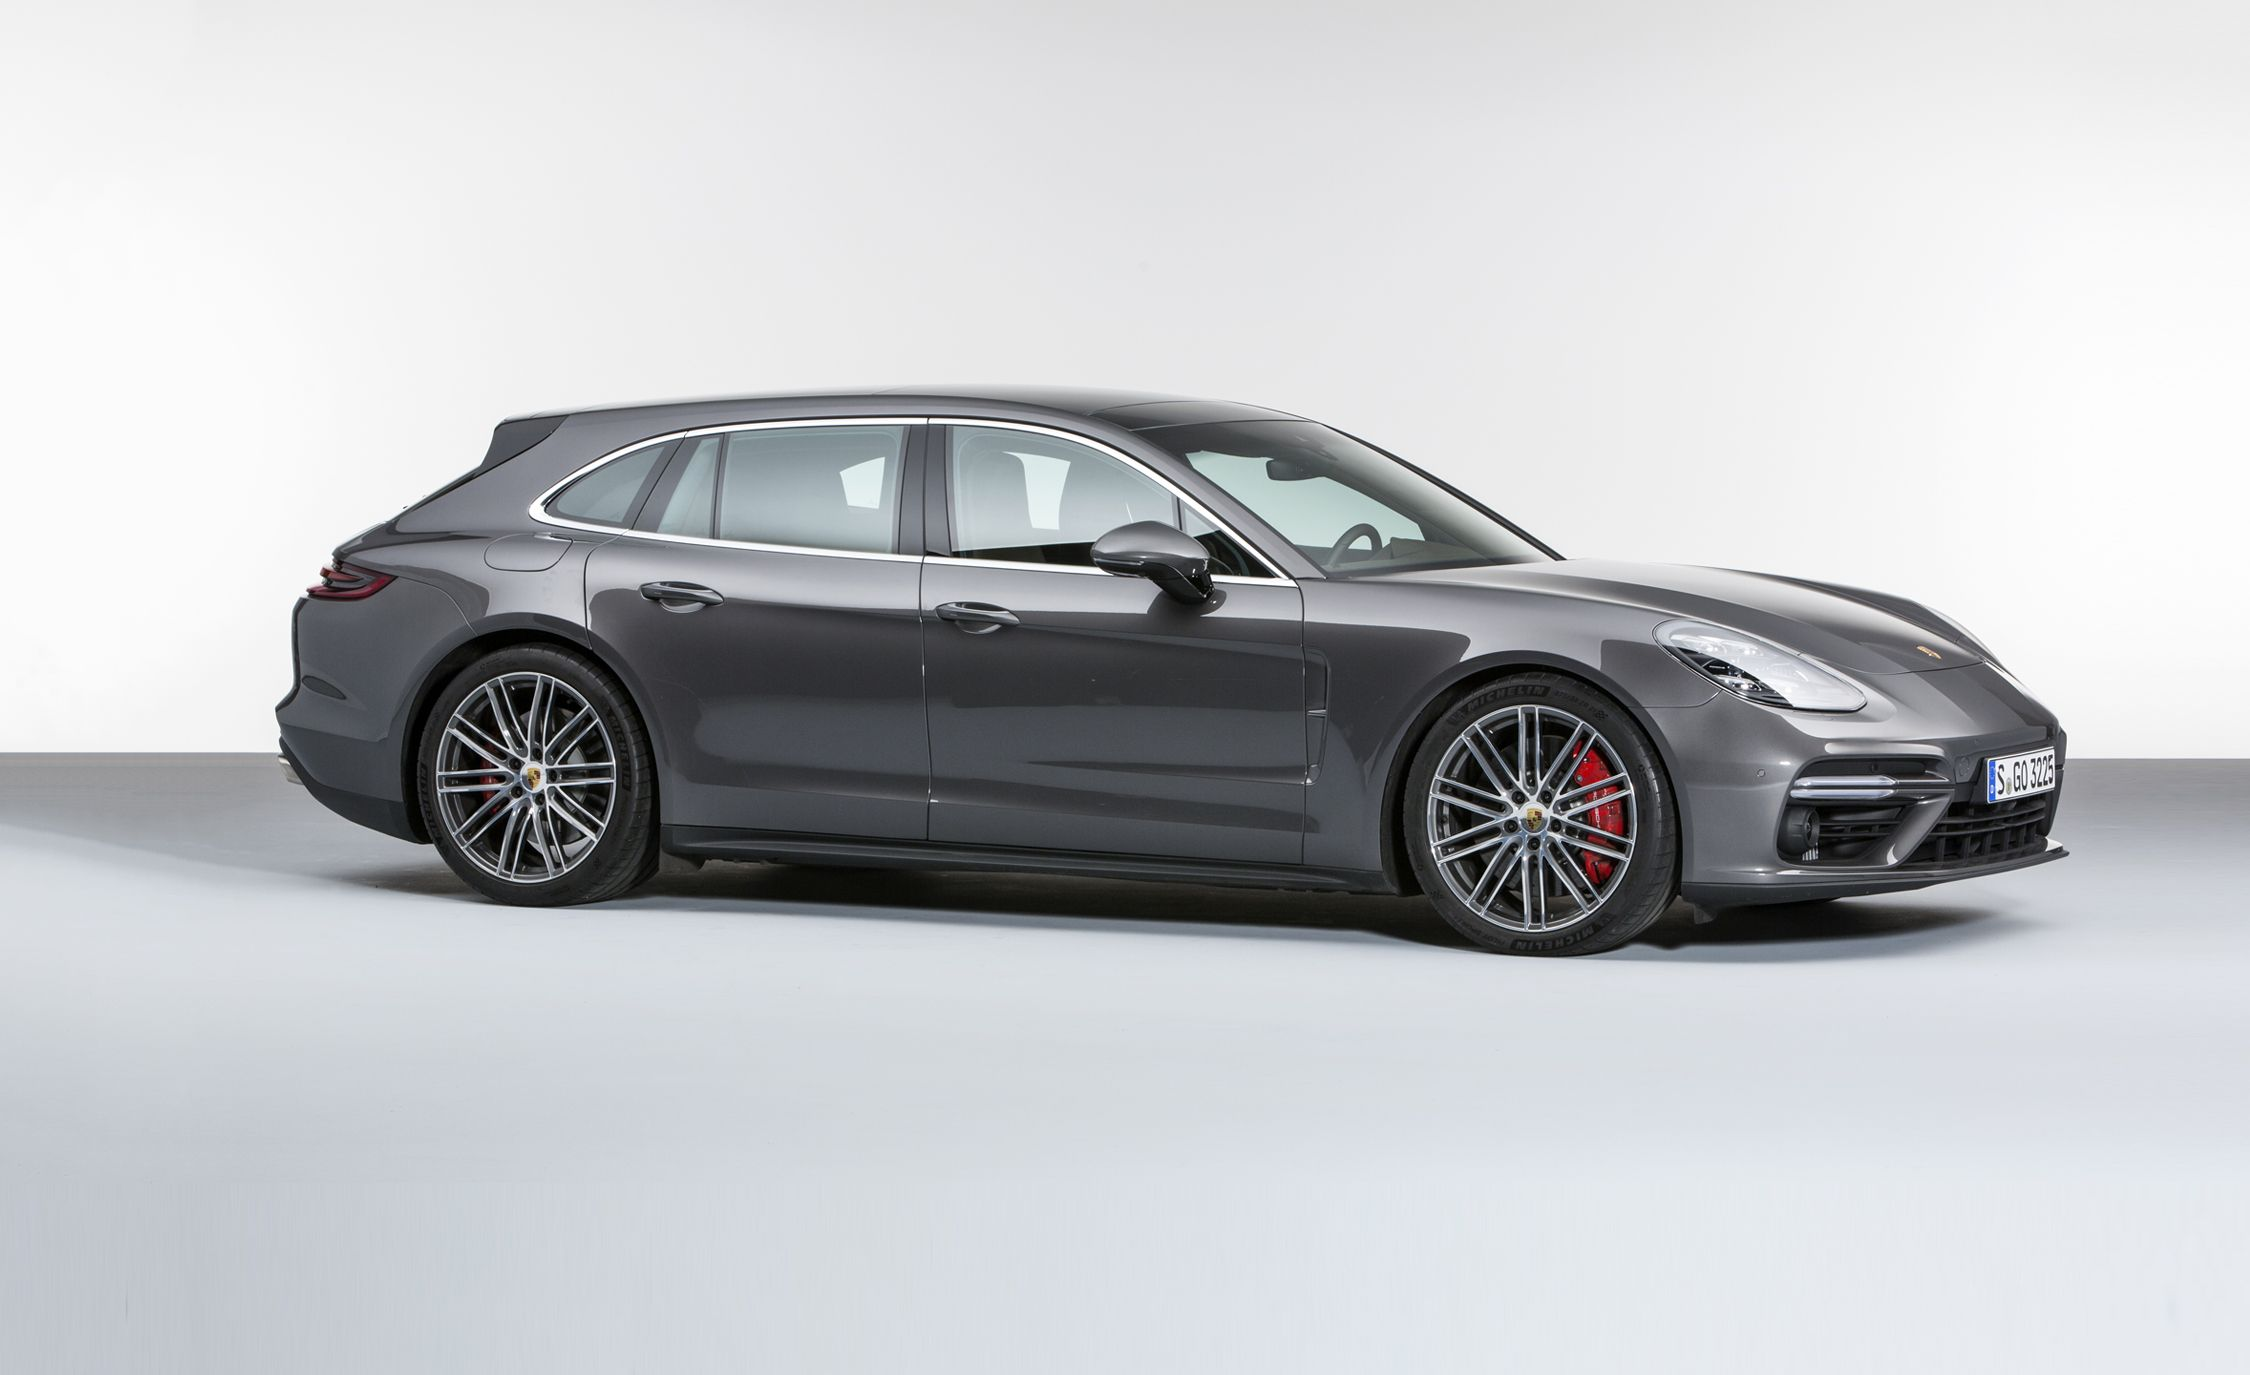 2018 Porsche Panamera Sport Turismo Photos and Info